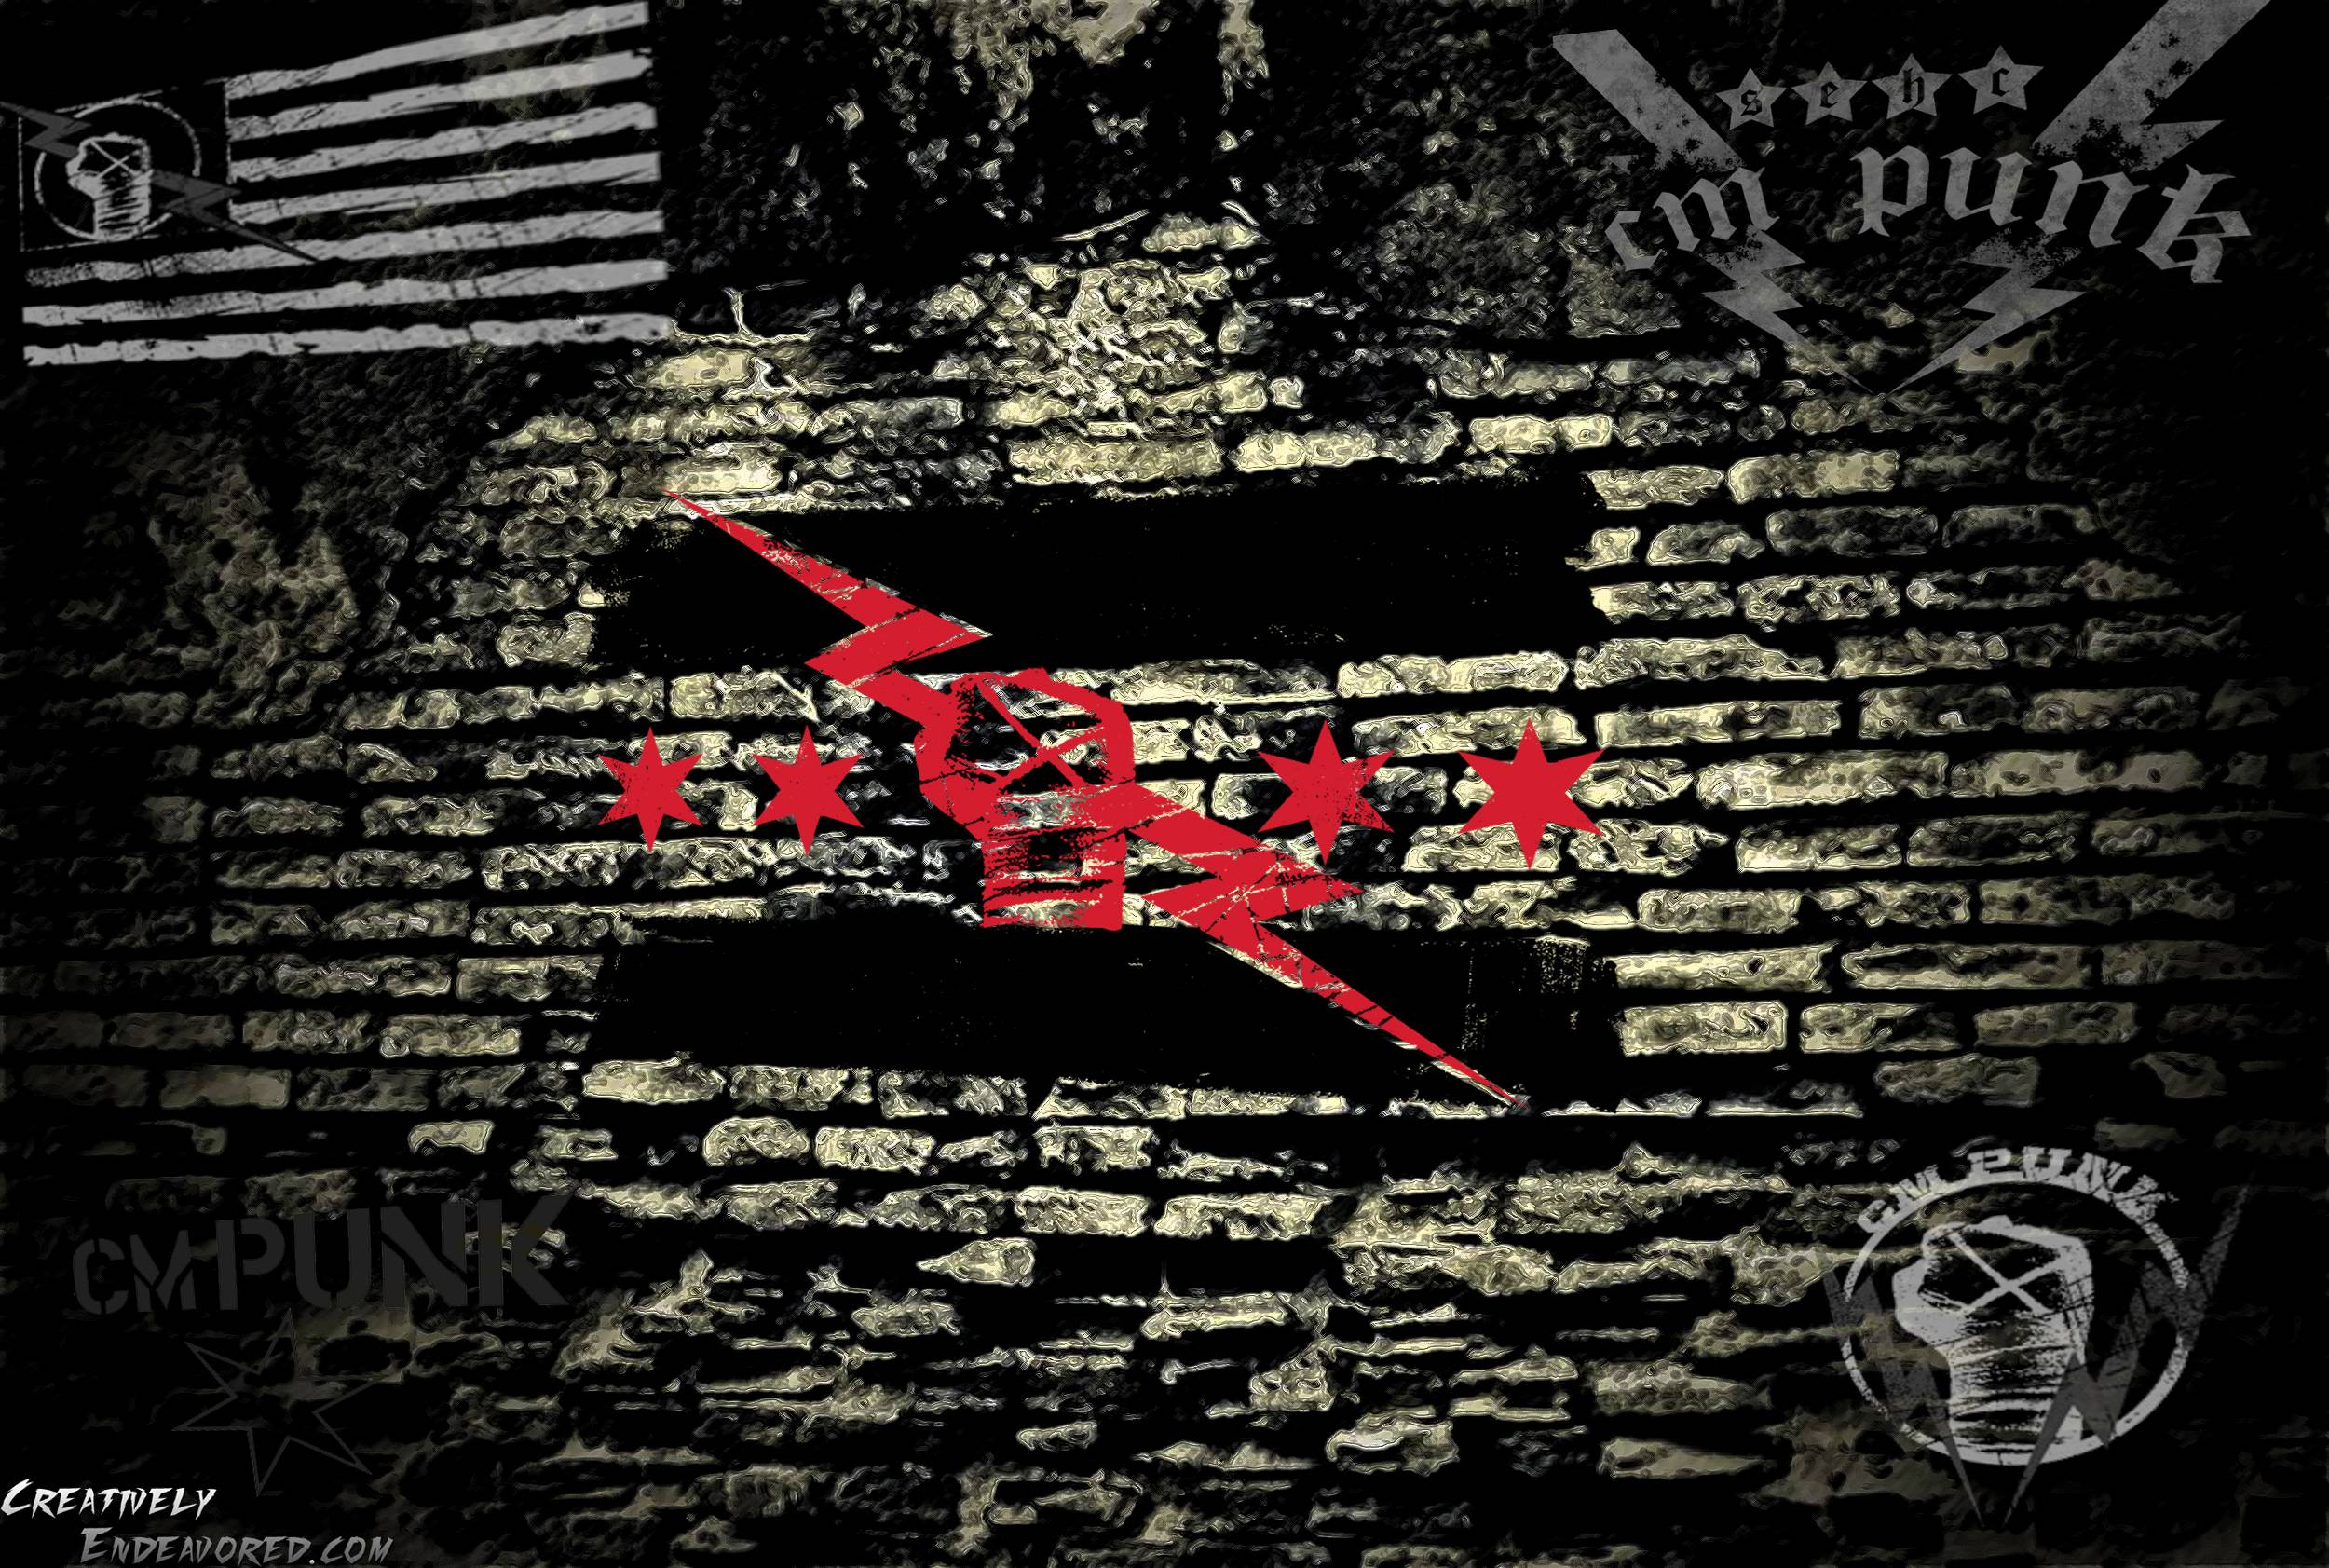 Cm punk logo wallpapers wallpaper cave cm punk logo wallpaper ceg voltagebd Image collections